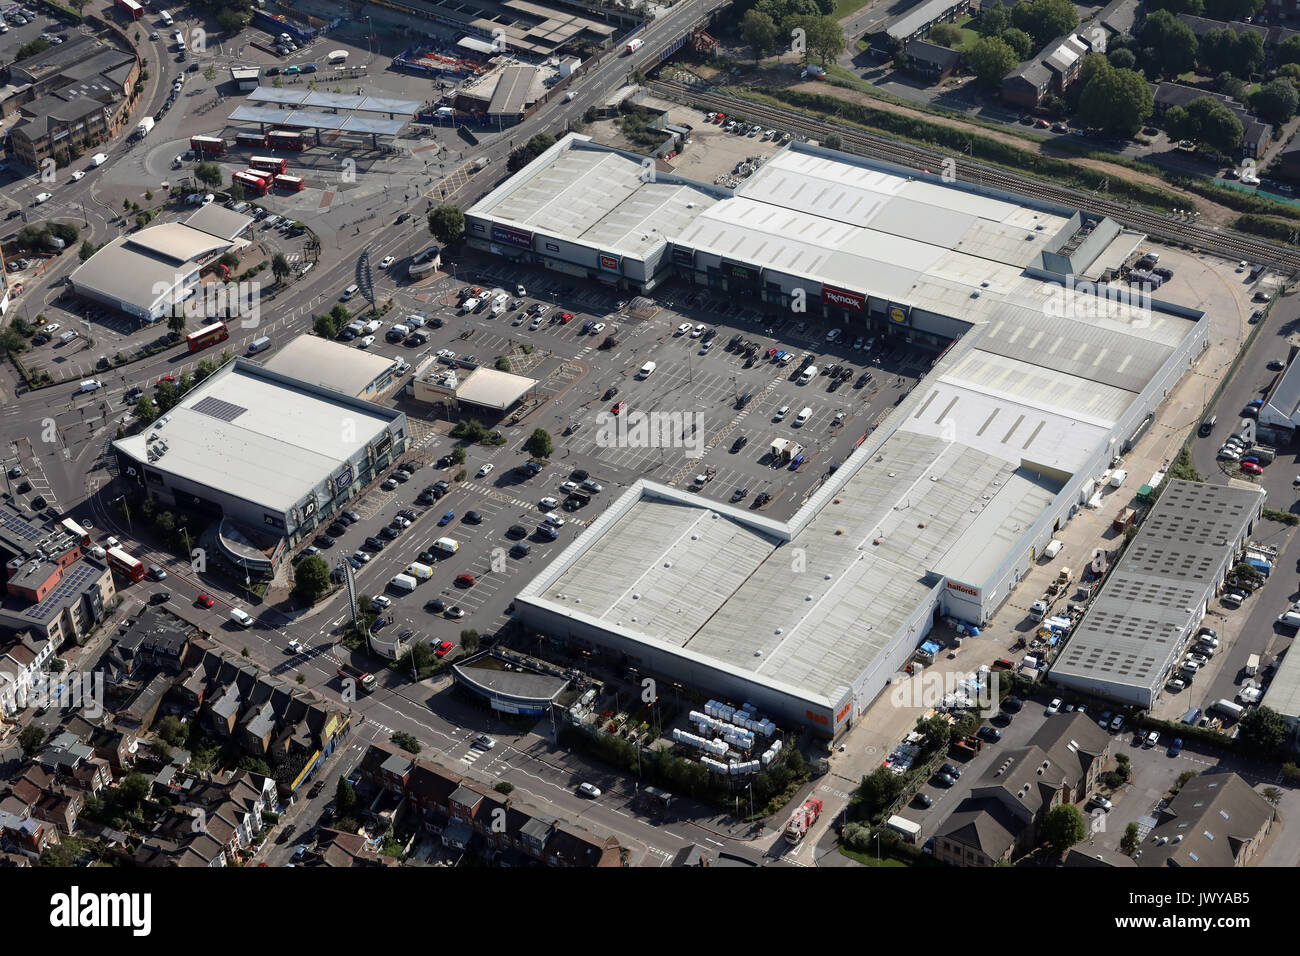 aerial view of Tottenham Hale Retail Park, London, UK - Stock Image